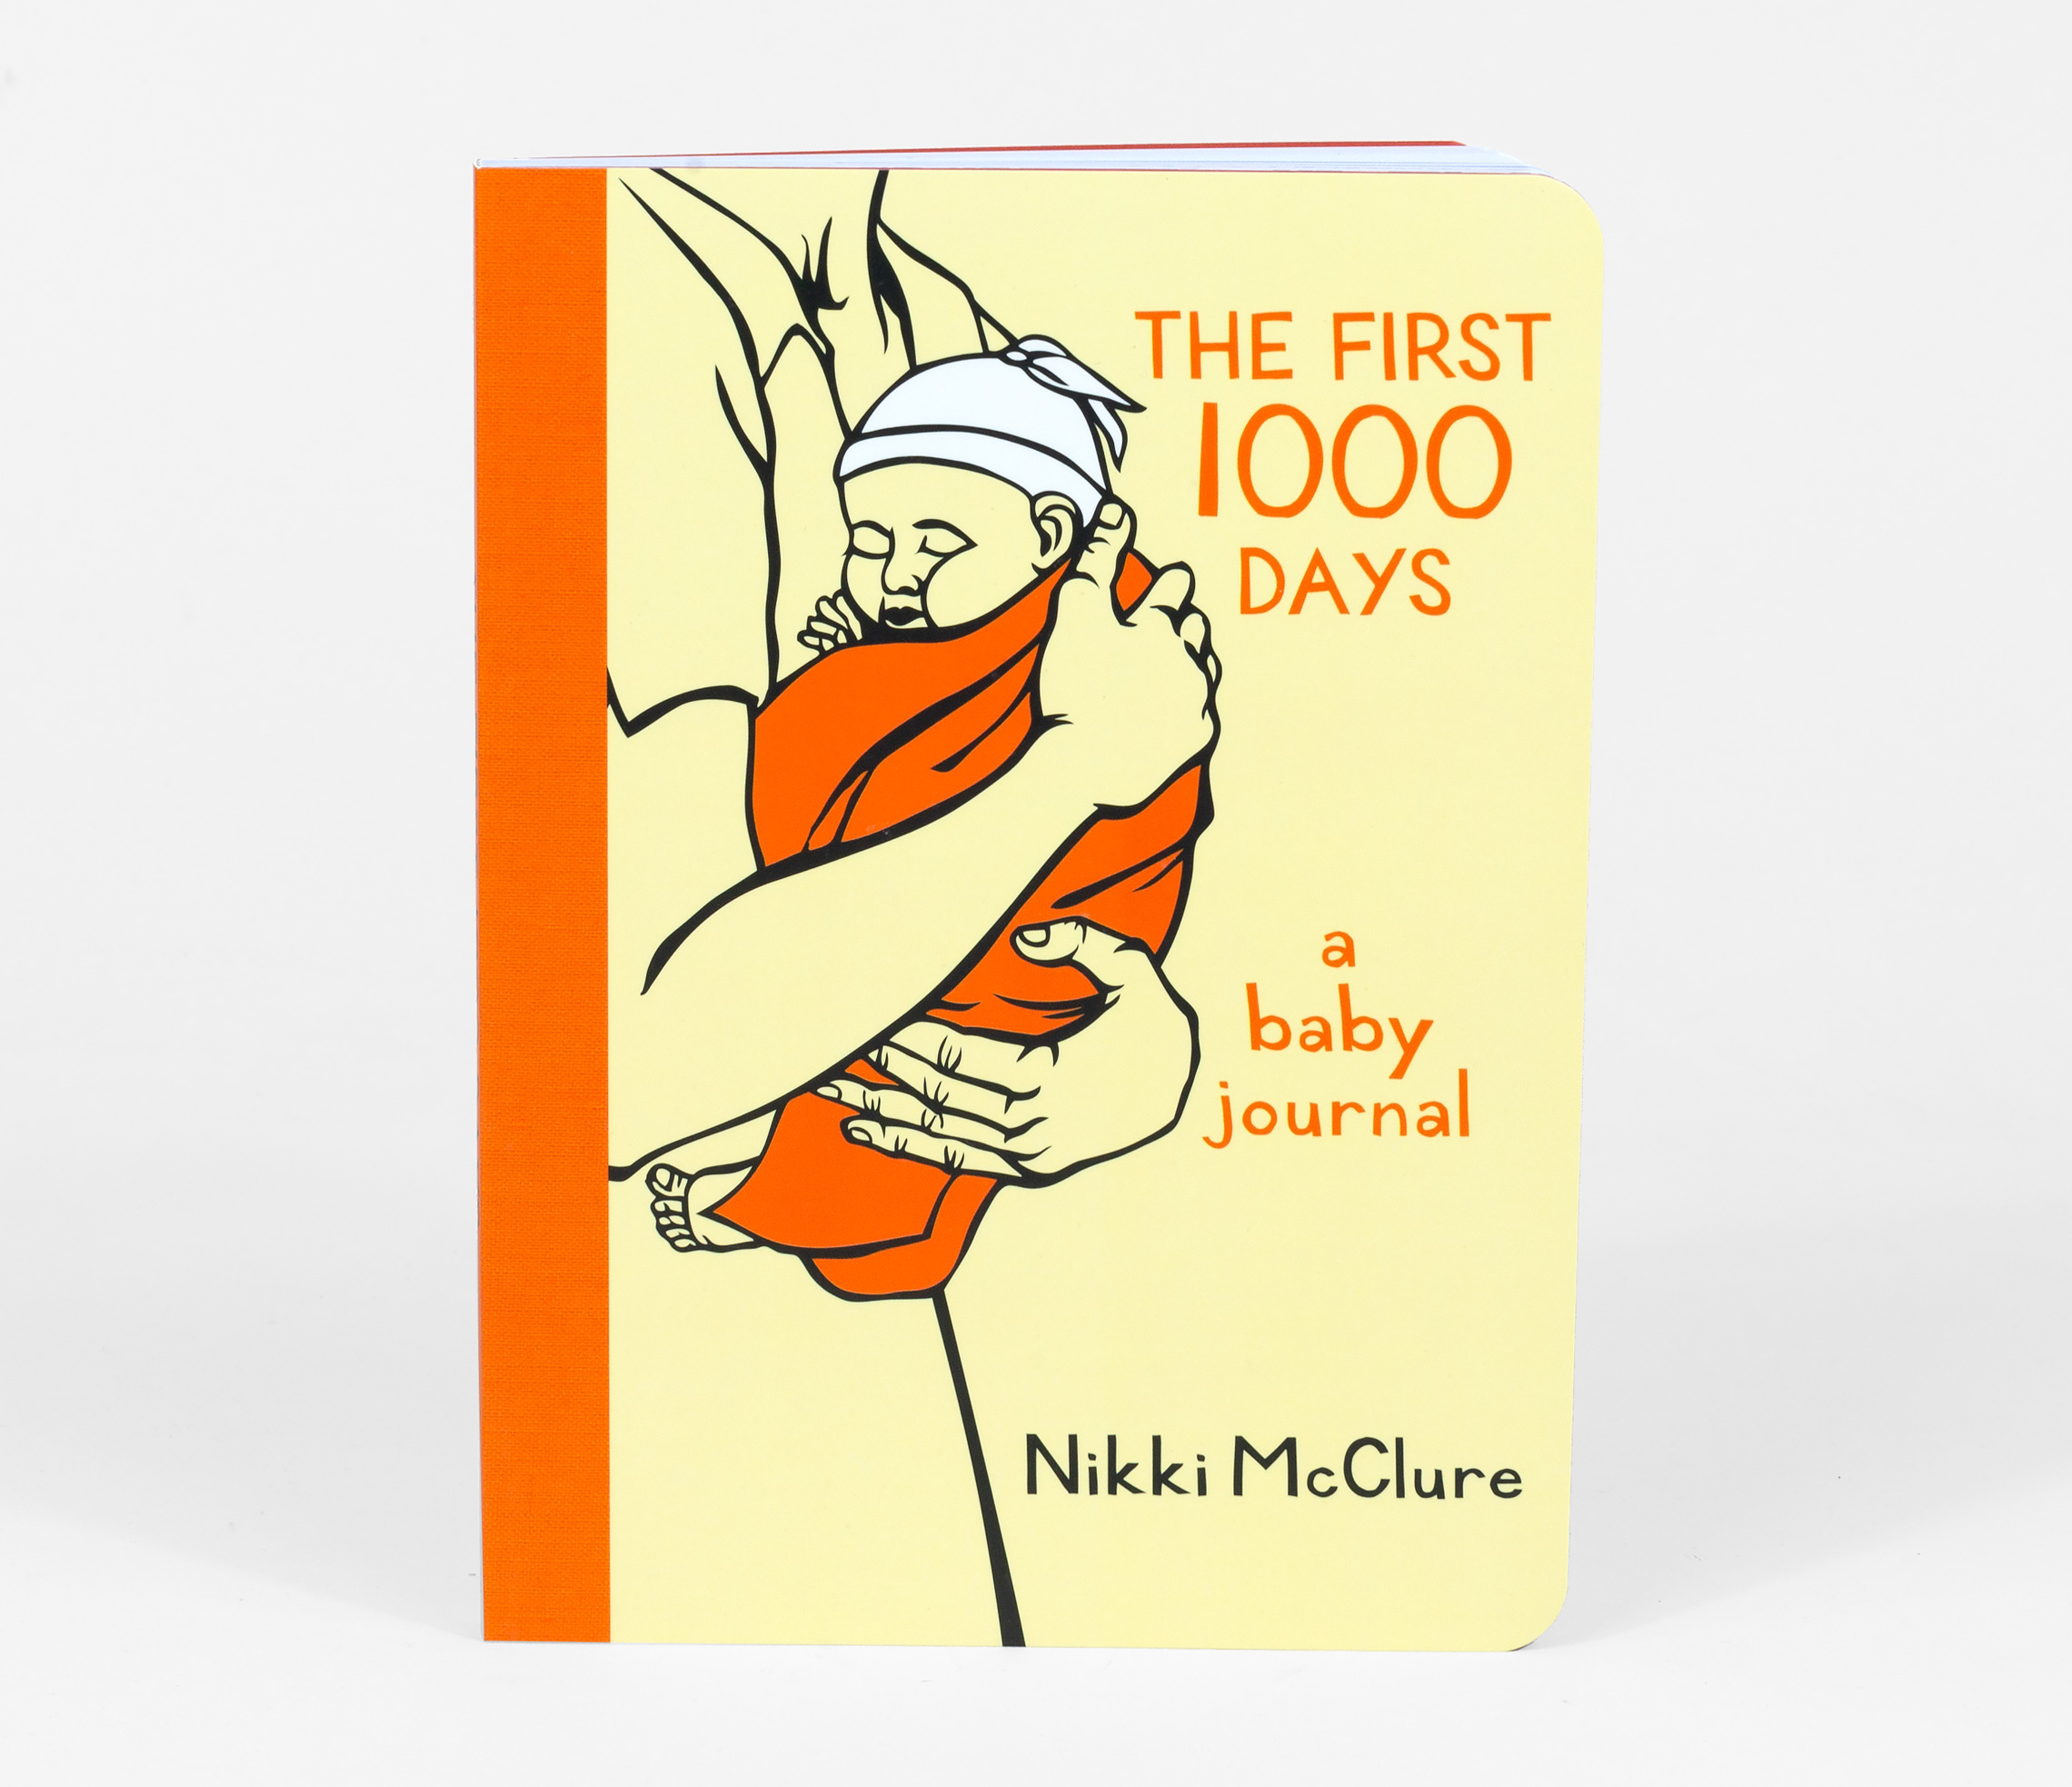 Nikki McClure - The First 1000 Days, journal